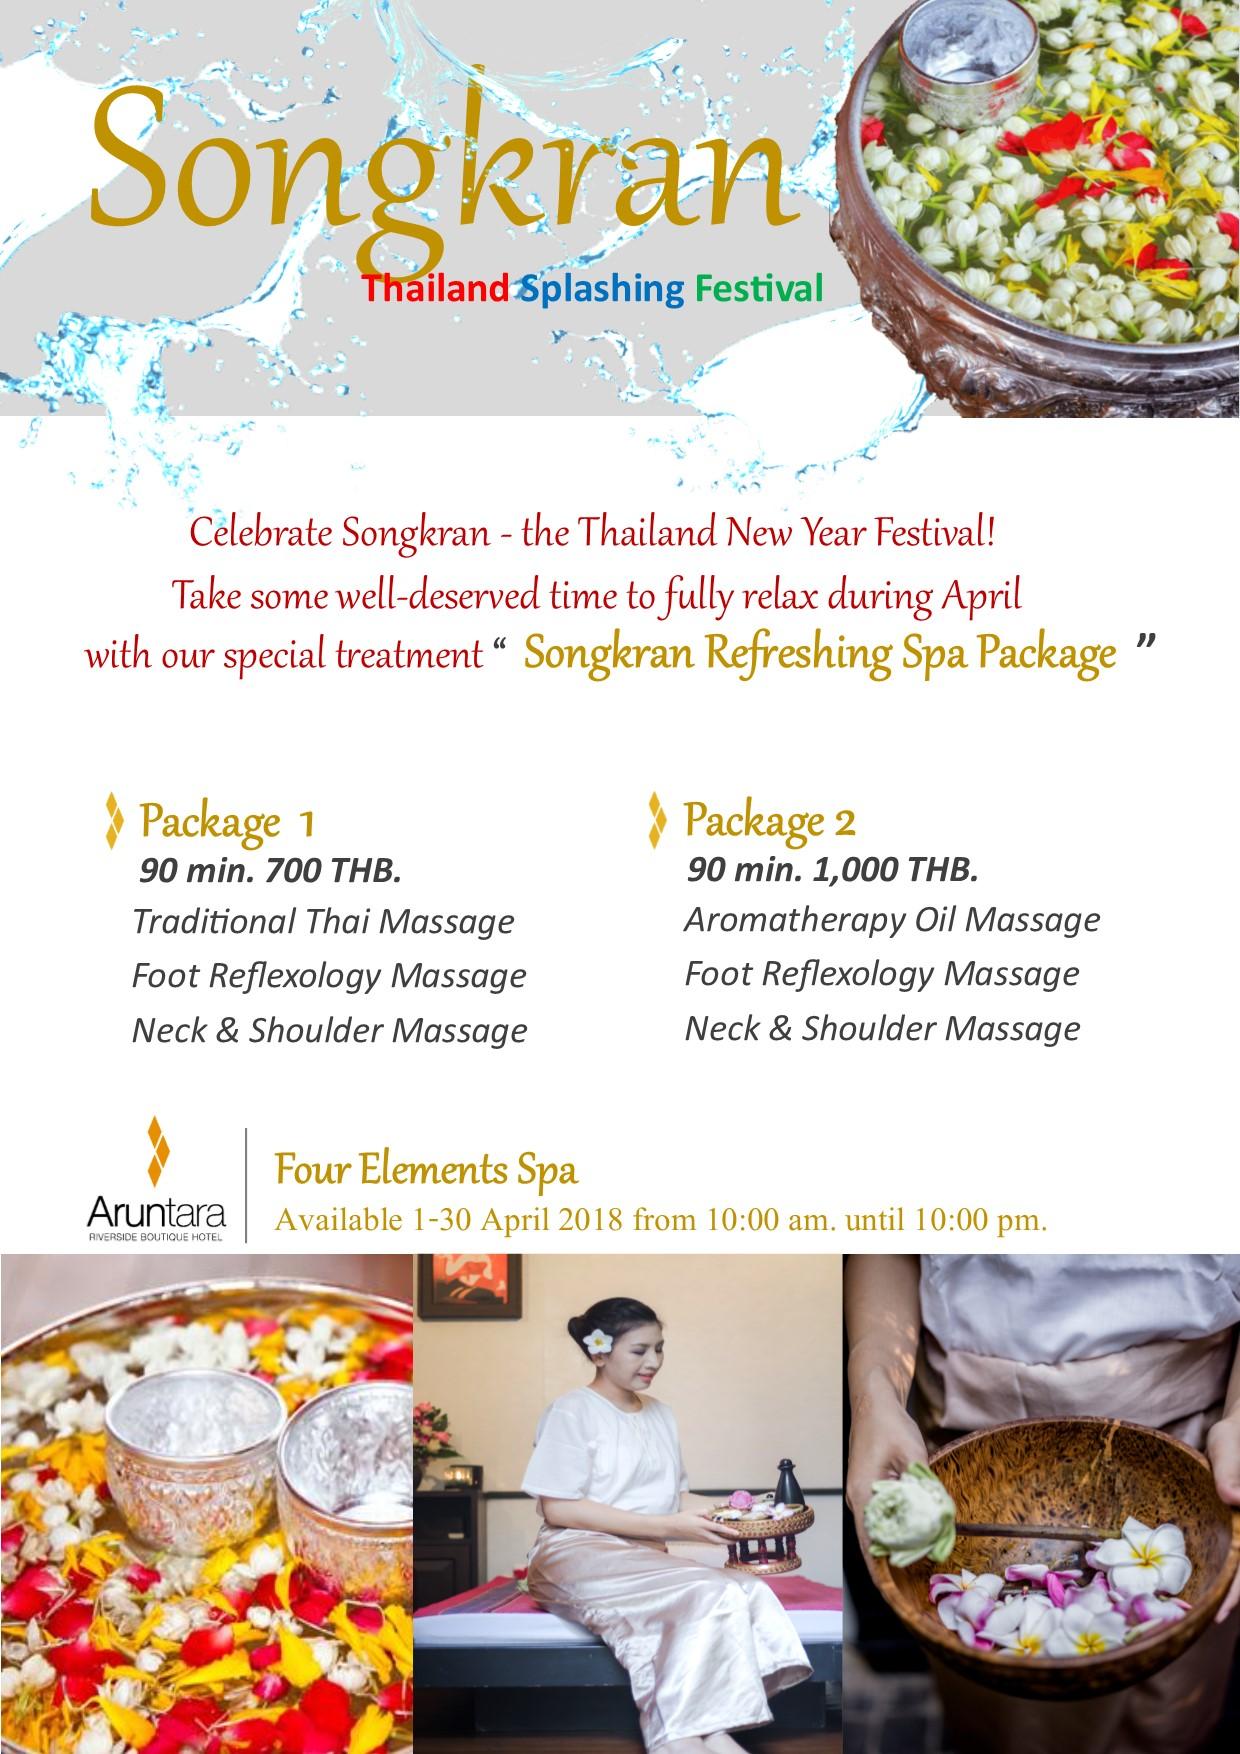 where to celebrate songkran 2018